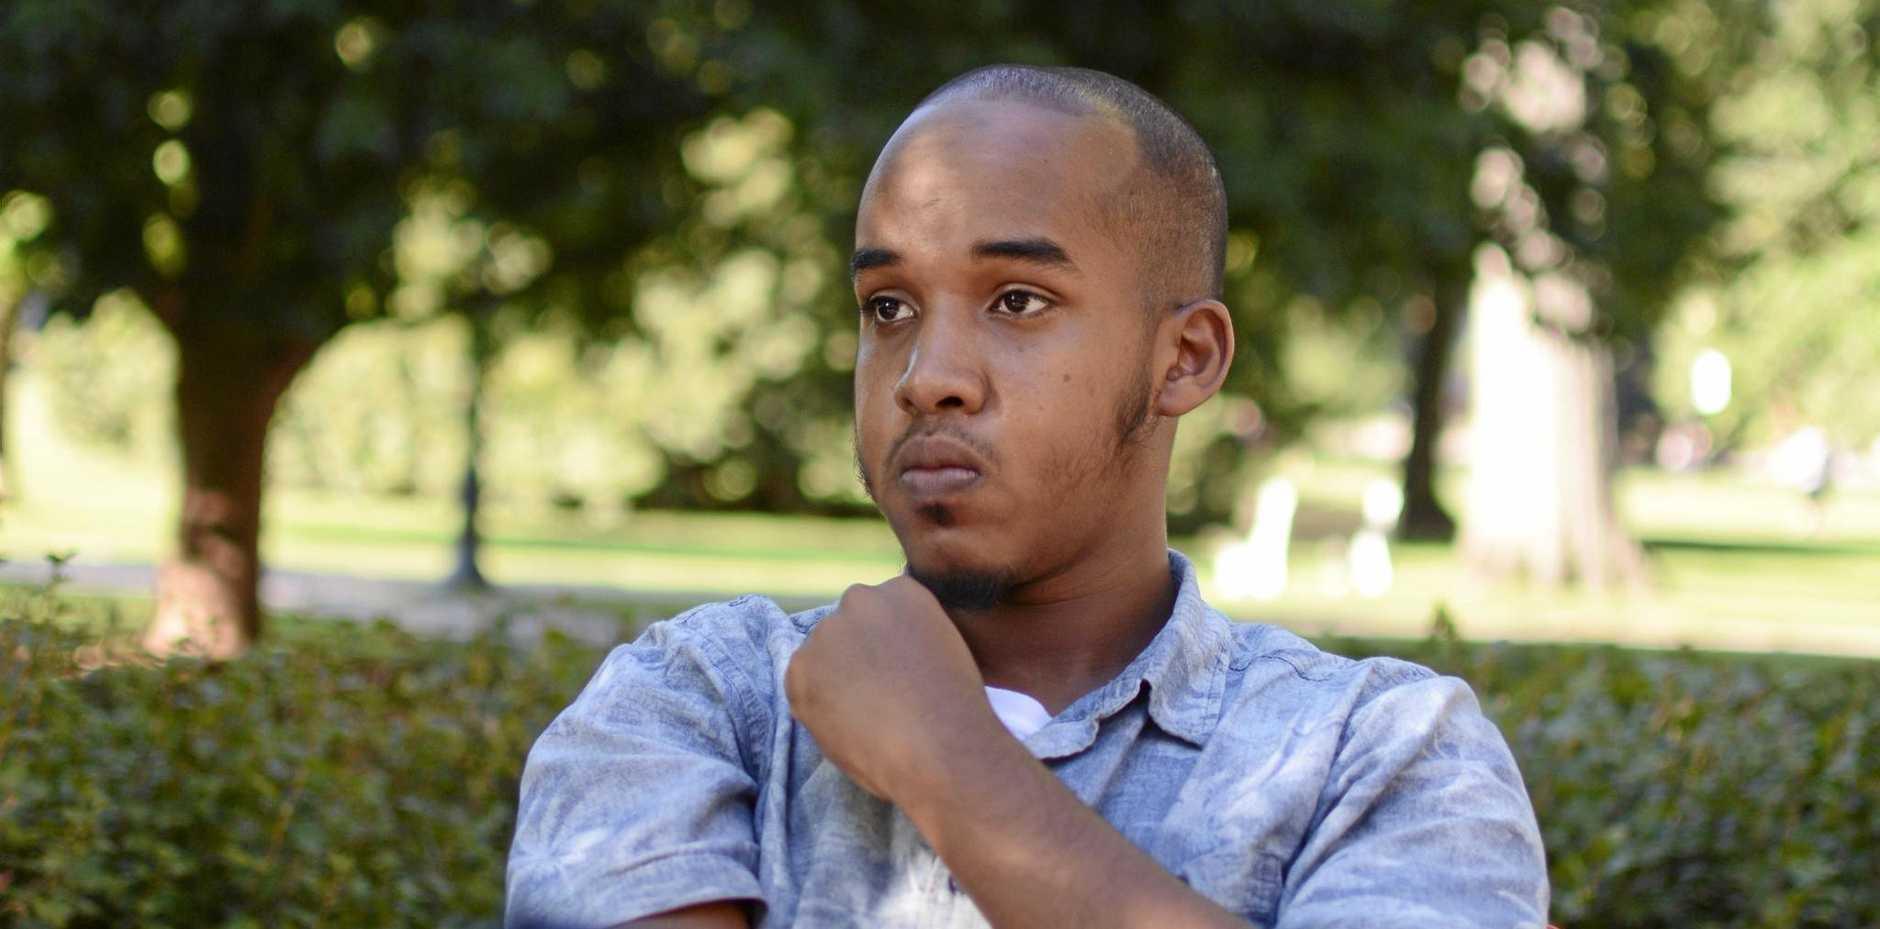 US police are trying to establish the motives of Ohio State University attacked Abdul Razak Ali Artan.